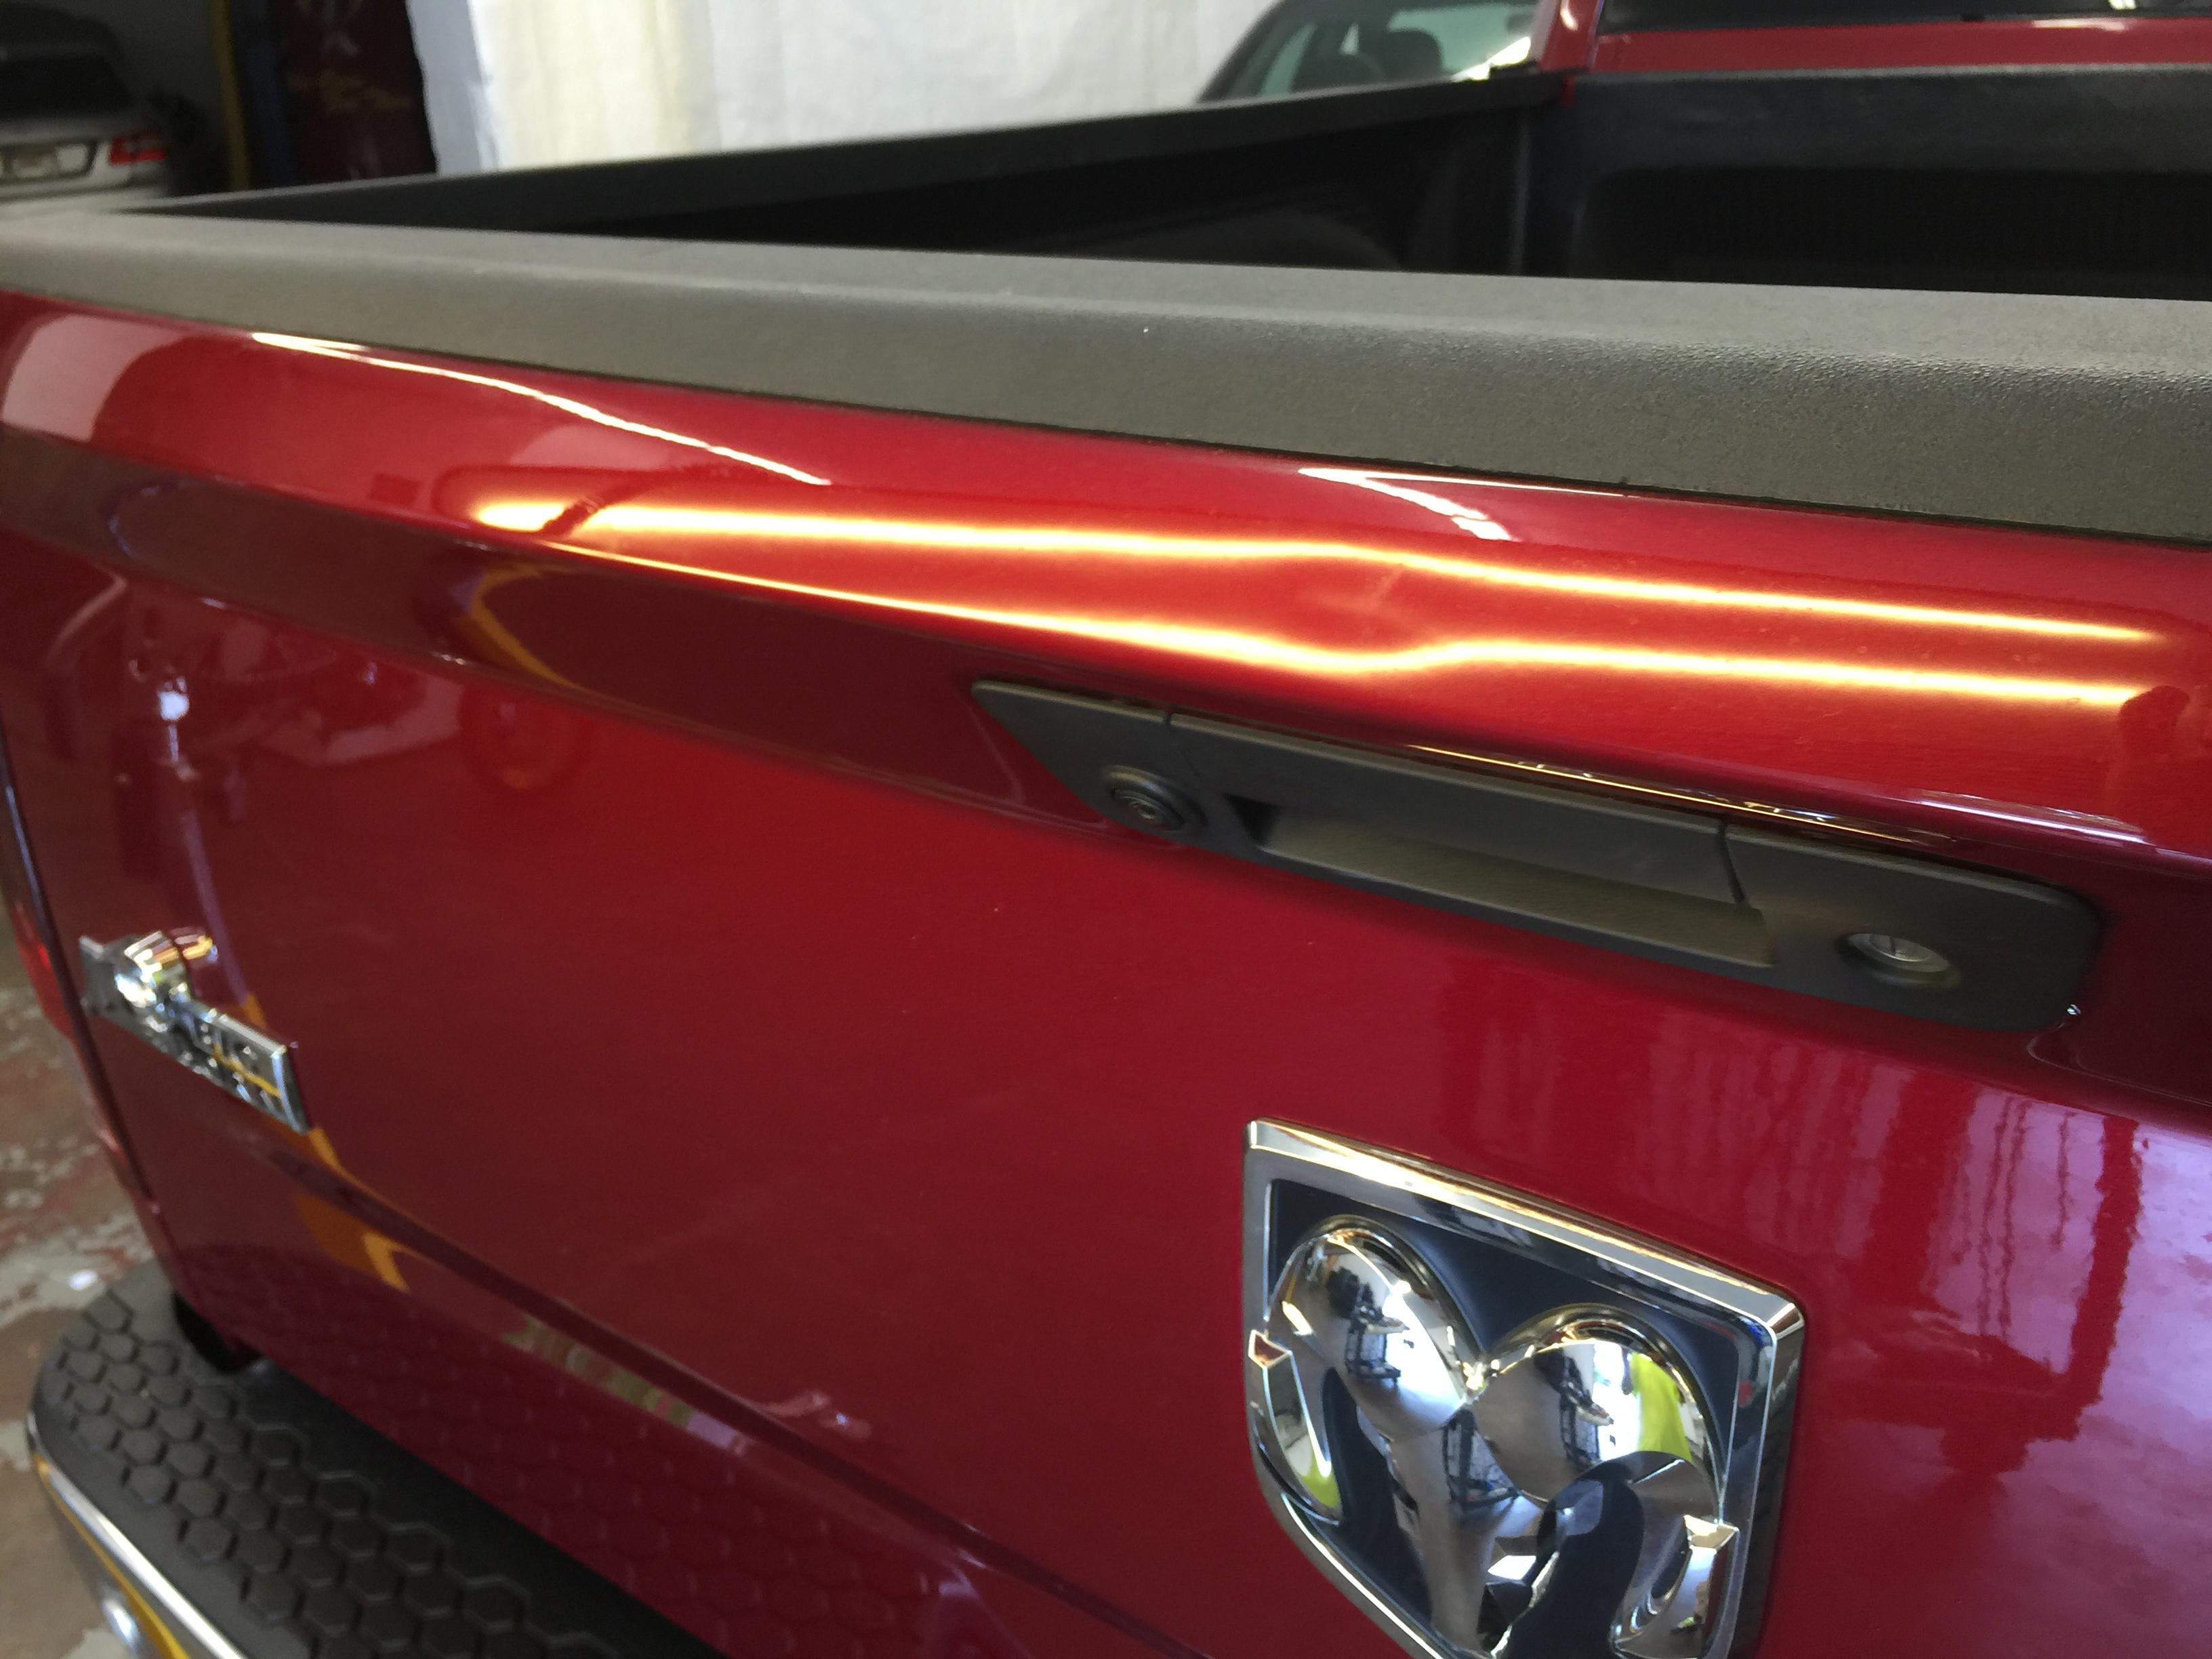 2015 Dodge Ram tailgate Dent repair in Springfield, IL, by Michael Bocek of http://217dent.com 217 dent Paintless Dent Repair